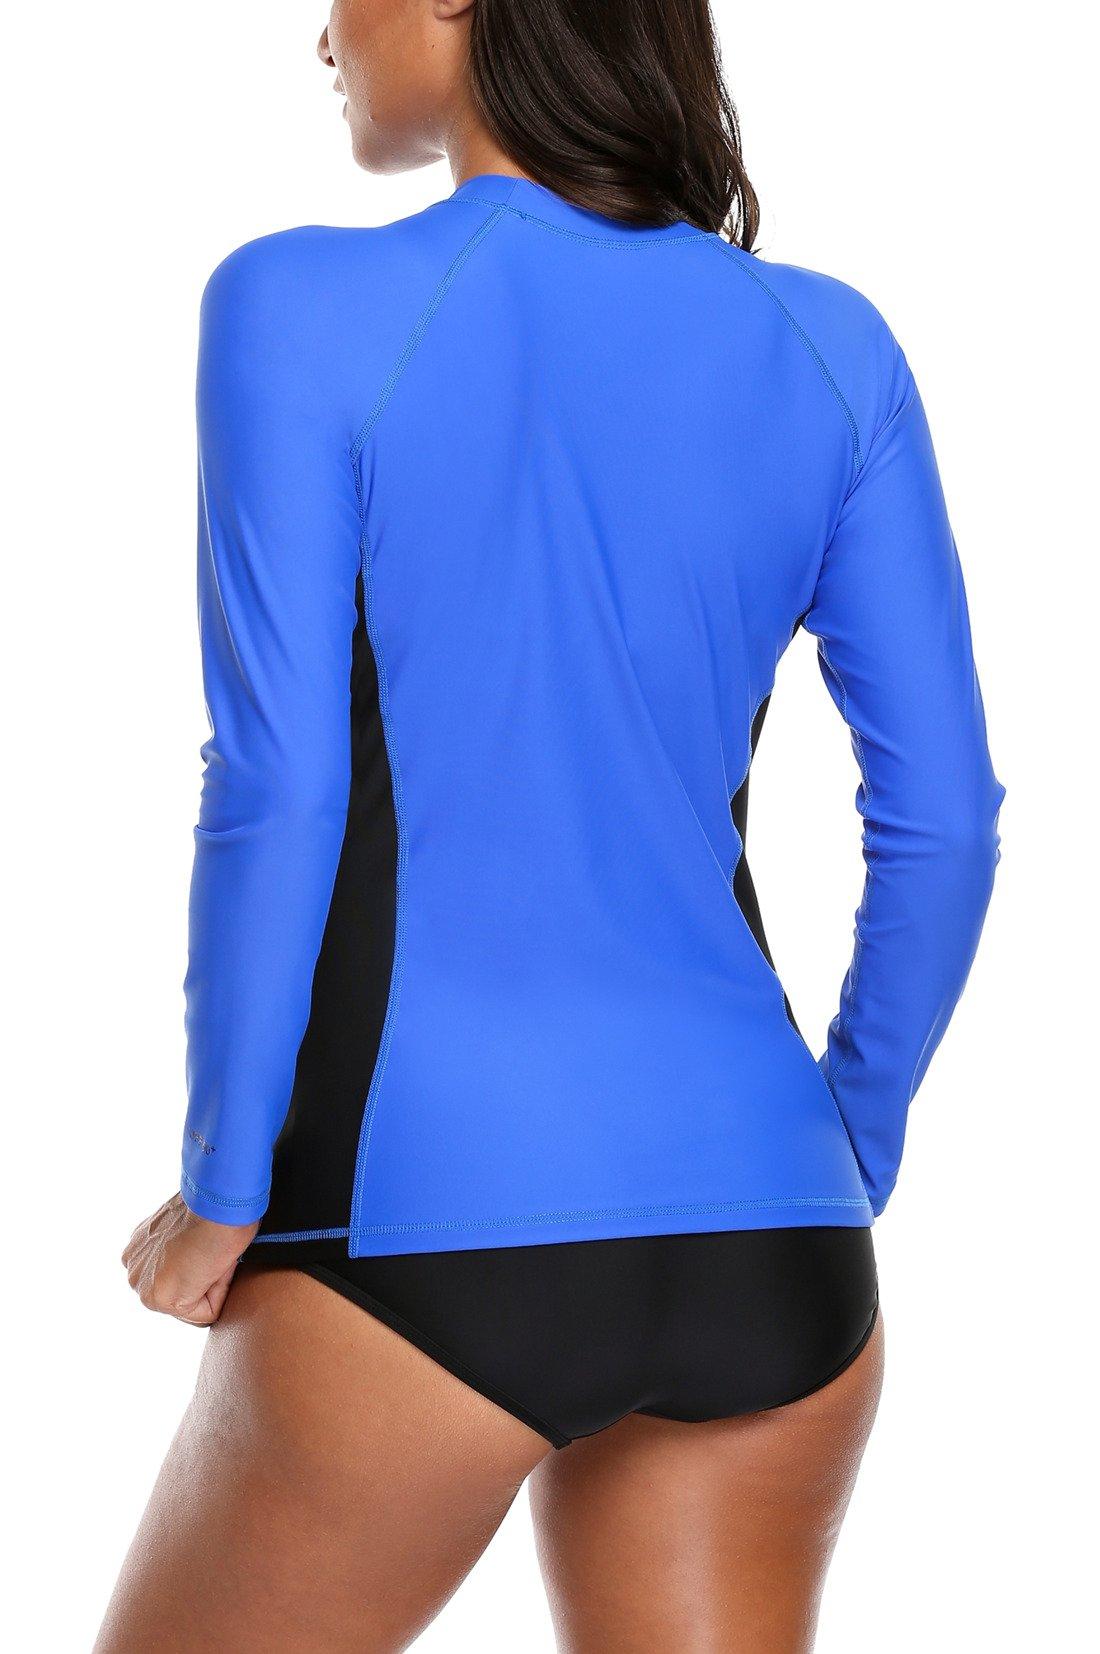 ALove Surf Shirt Rash Guard UPF 50 Athletic Top Womens Surf Rashguard Long Sleeve Medium by ALove (Image #5)